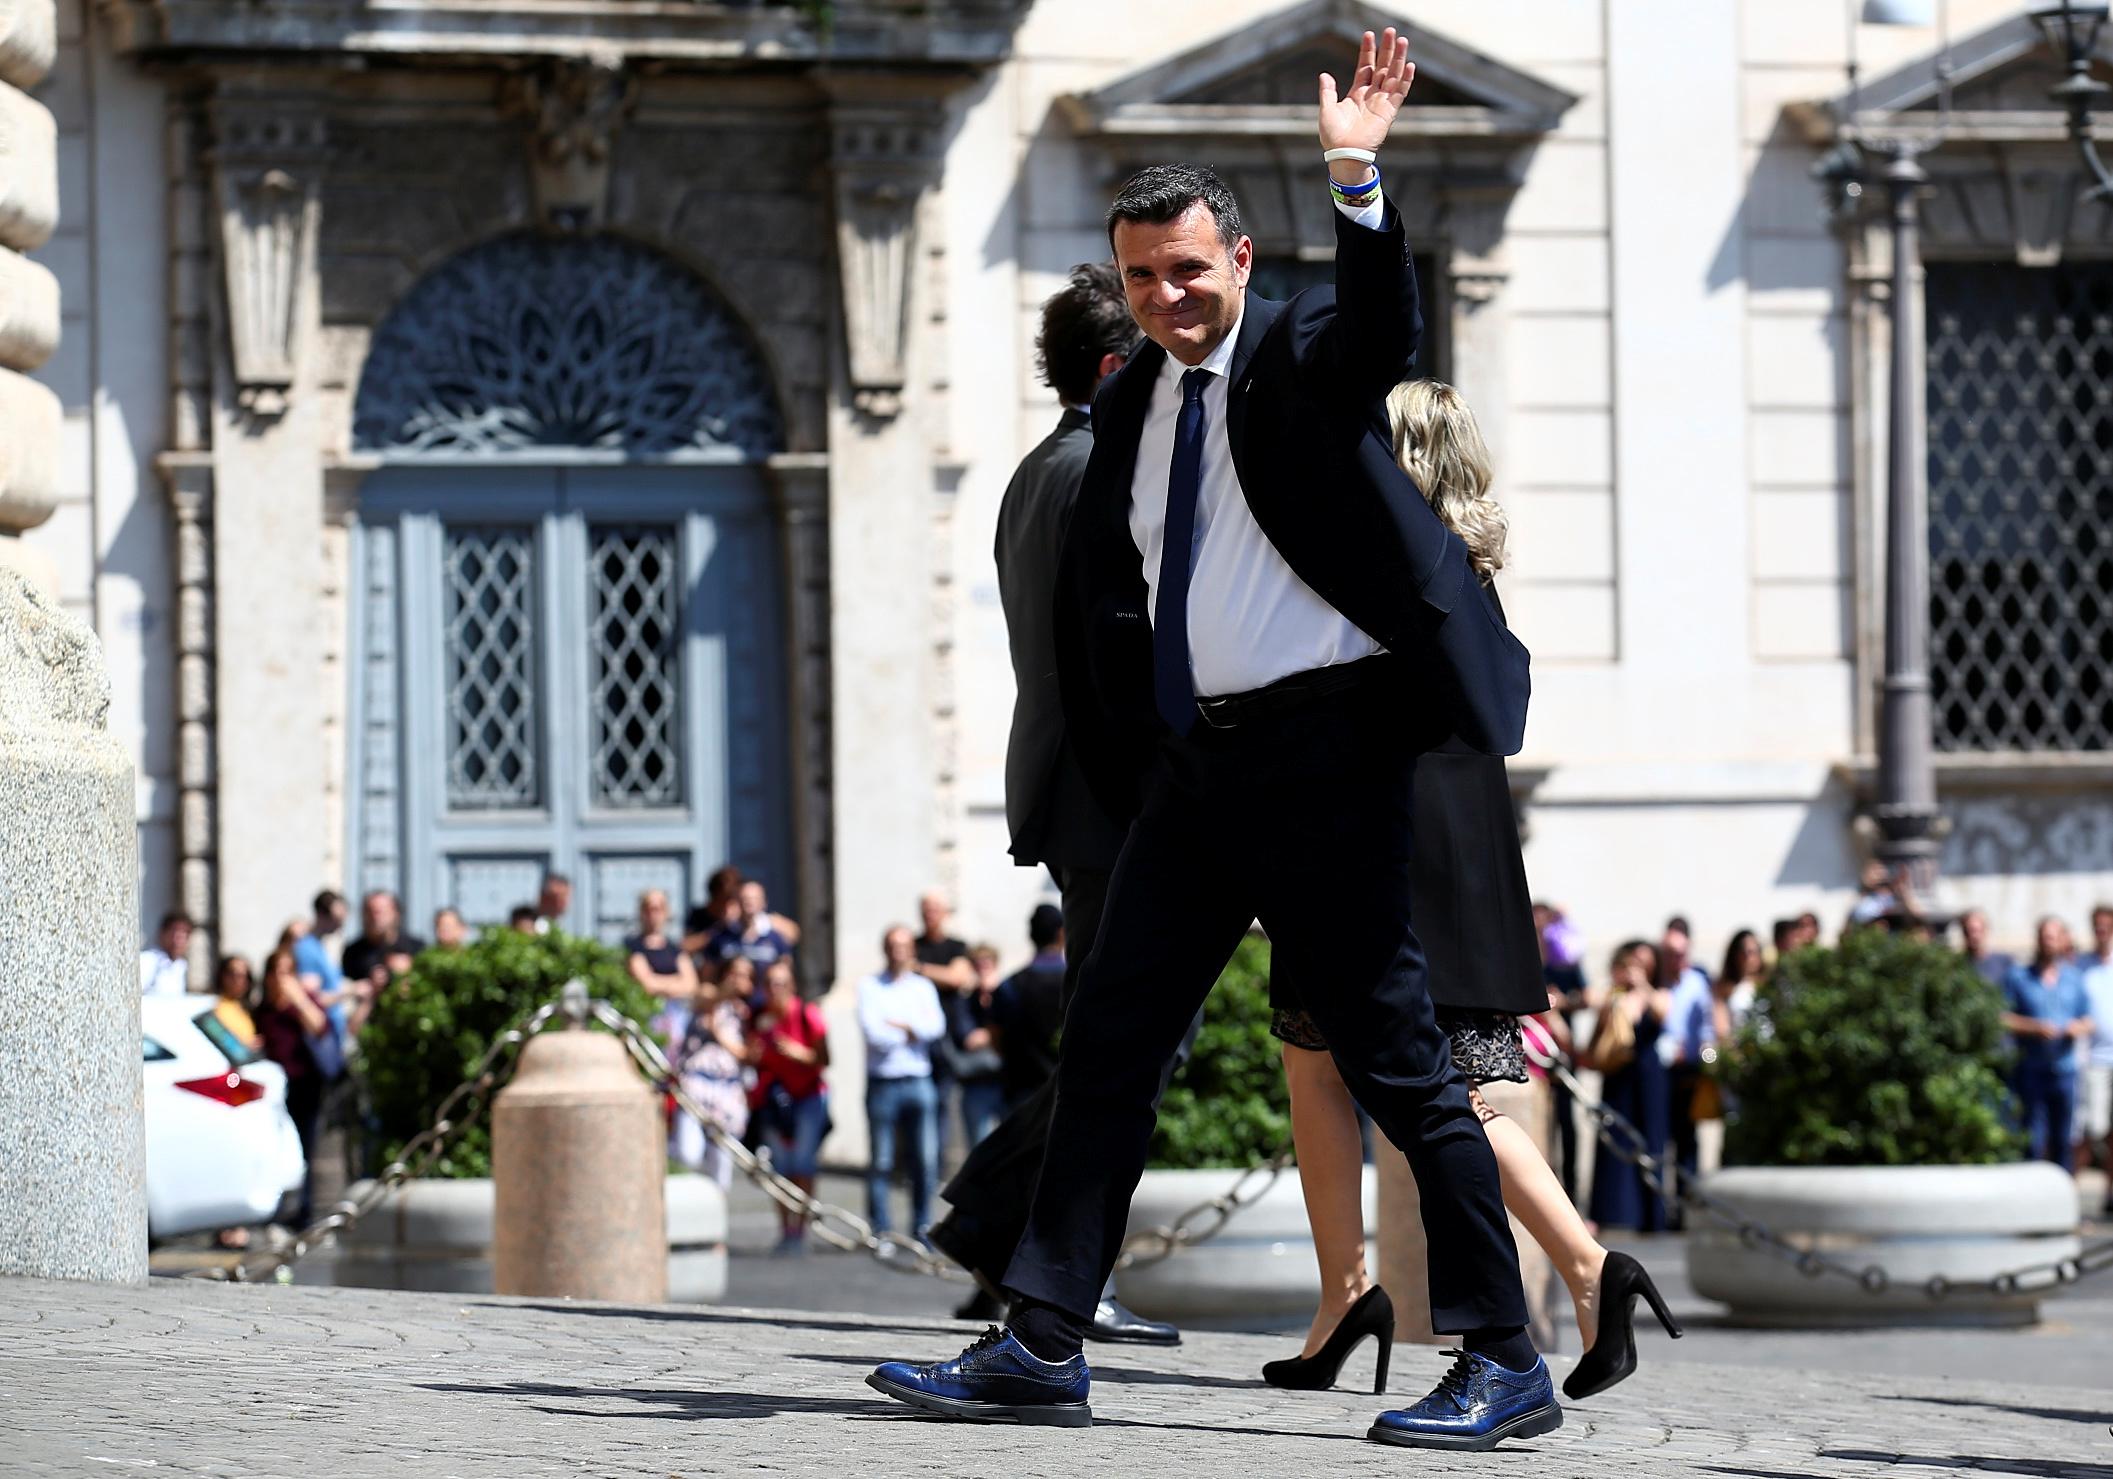 Parlamento italiano rechazar tratado de libre comercio for Concorsi parlamento italiano 2017